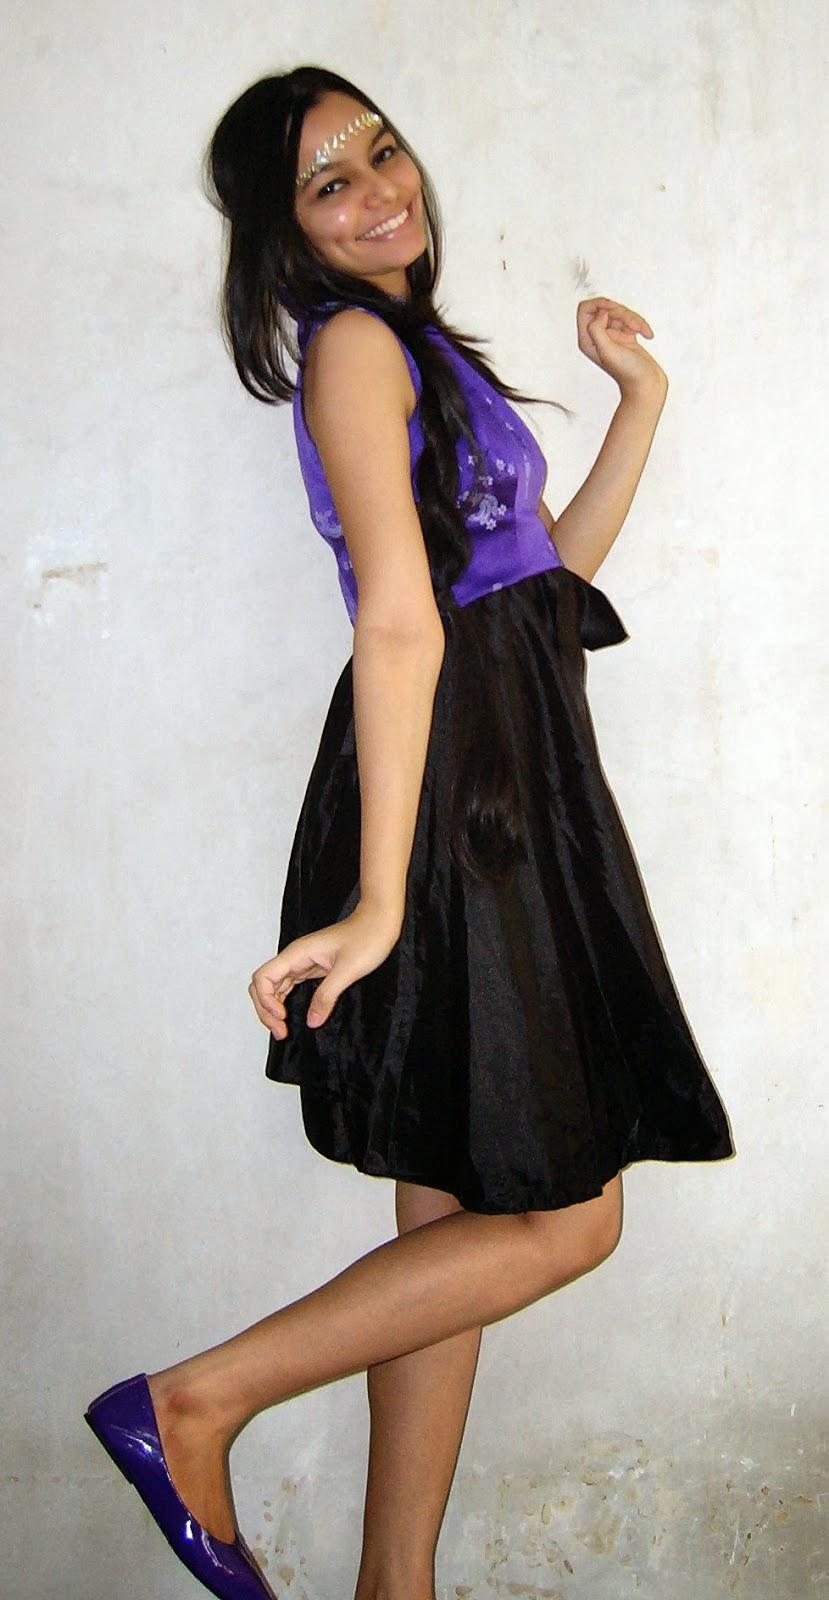 midi skirts, circle skirt, high waist skirts, how to wear skirts, heabands, how to wear a headband